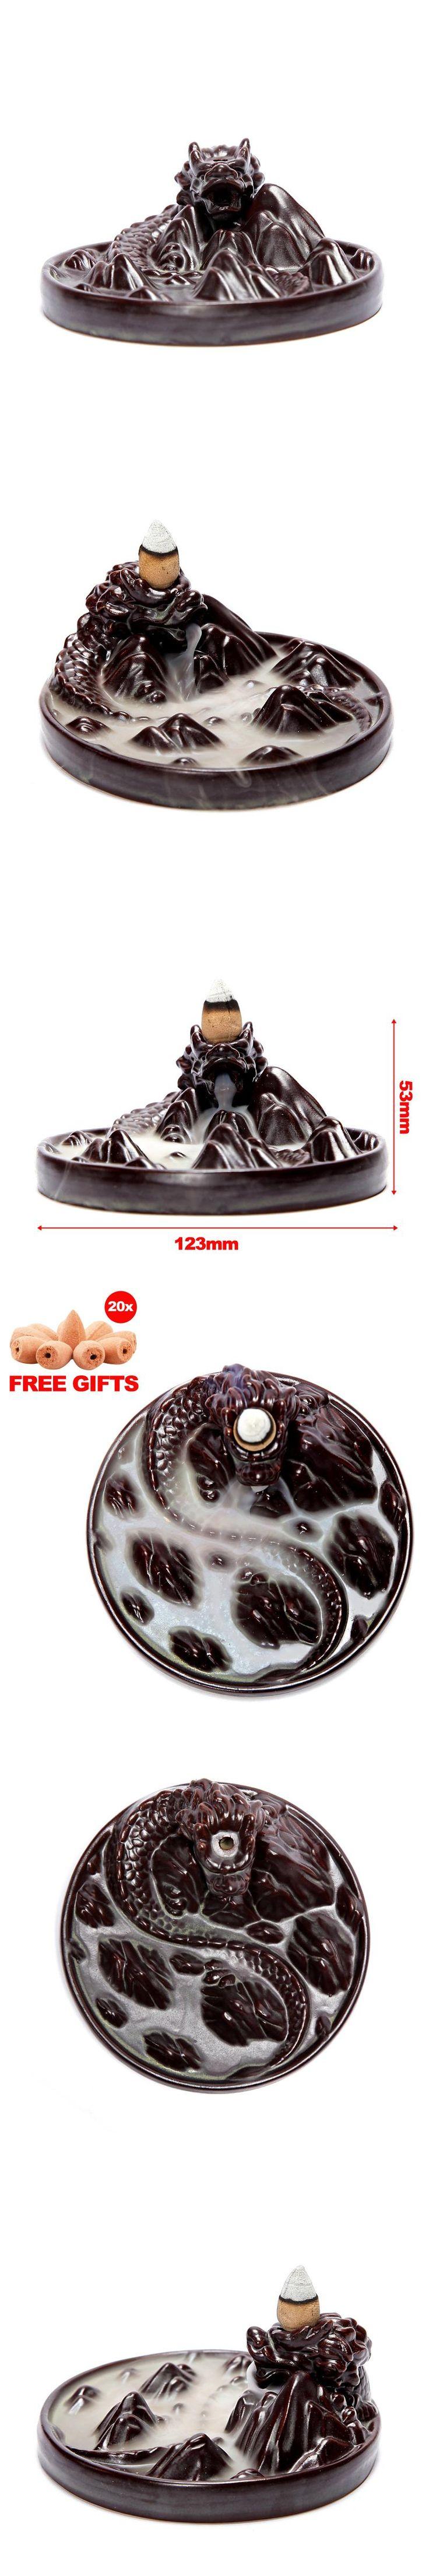 20 Pcs Incense Cones + Dragon Backflow Incense Burner Holder Home Decor Aromatherapy Ceramic Censer